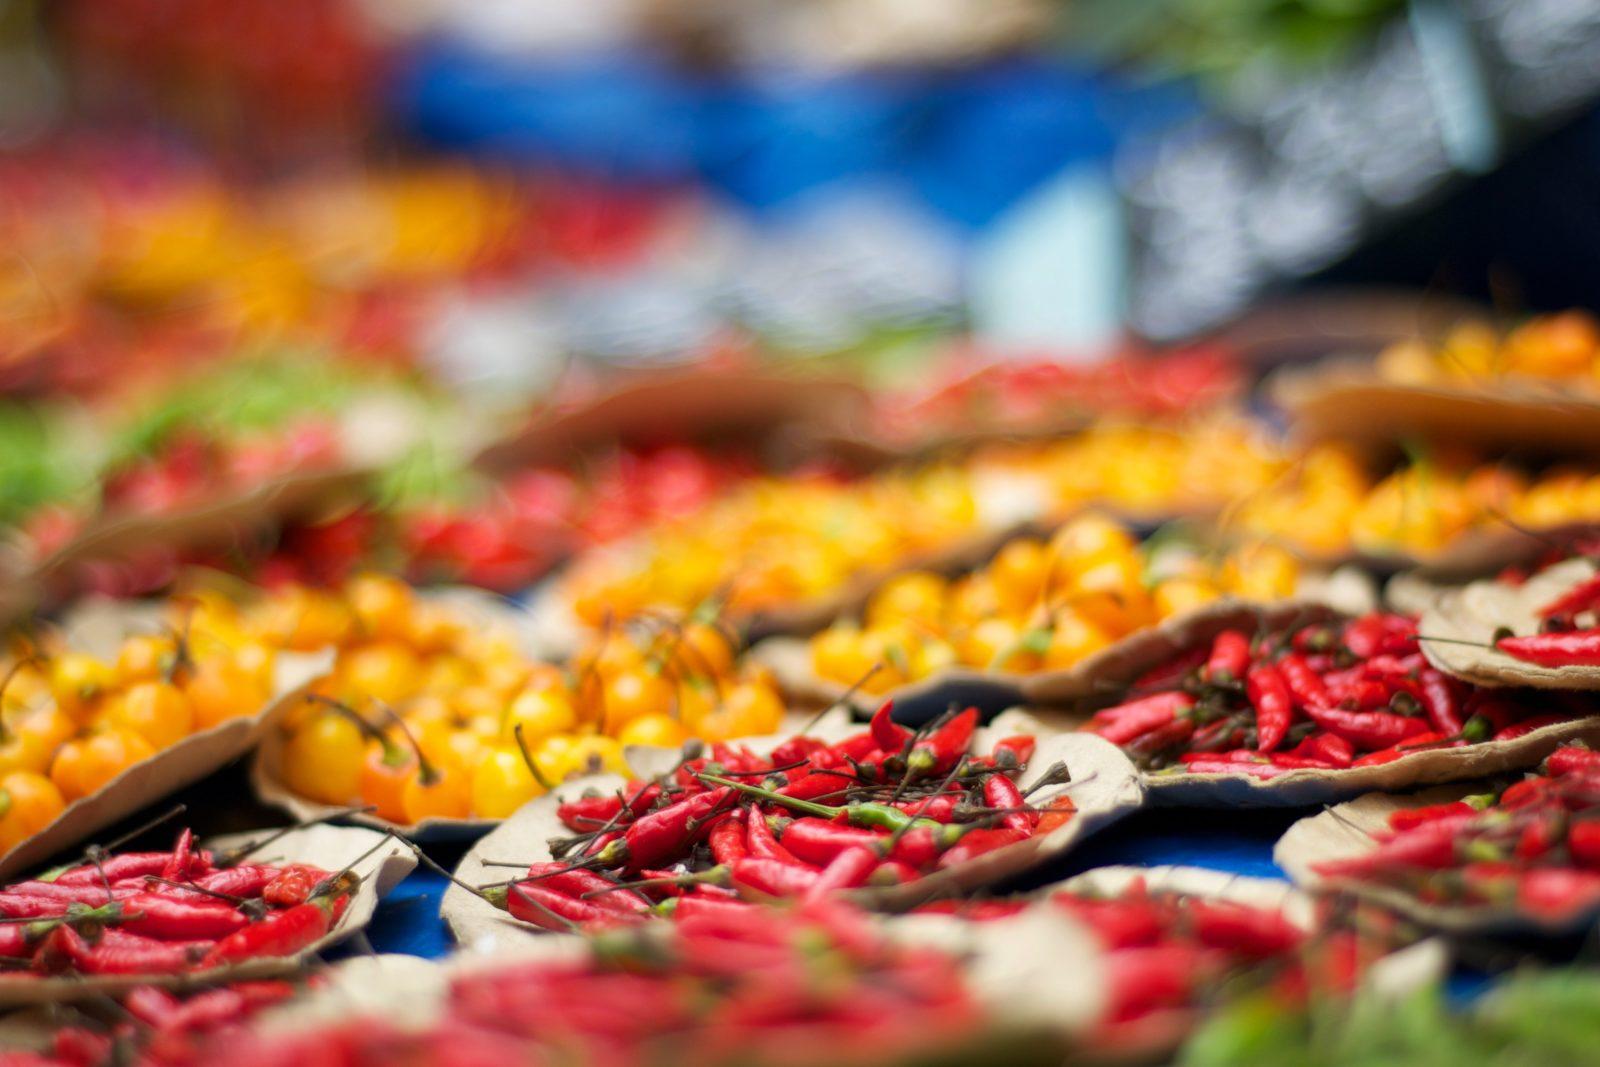 abundance-assortment-chili-pepper- Glaucio Guerra